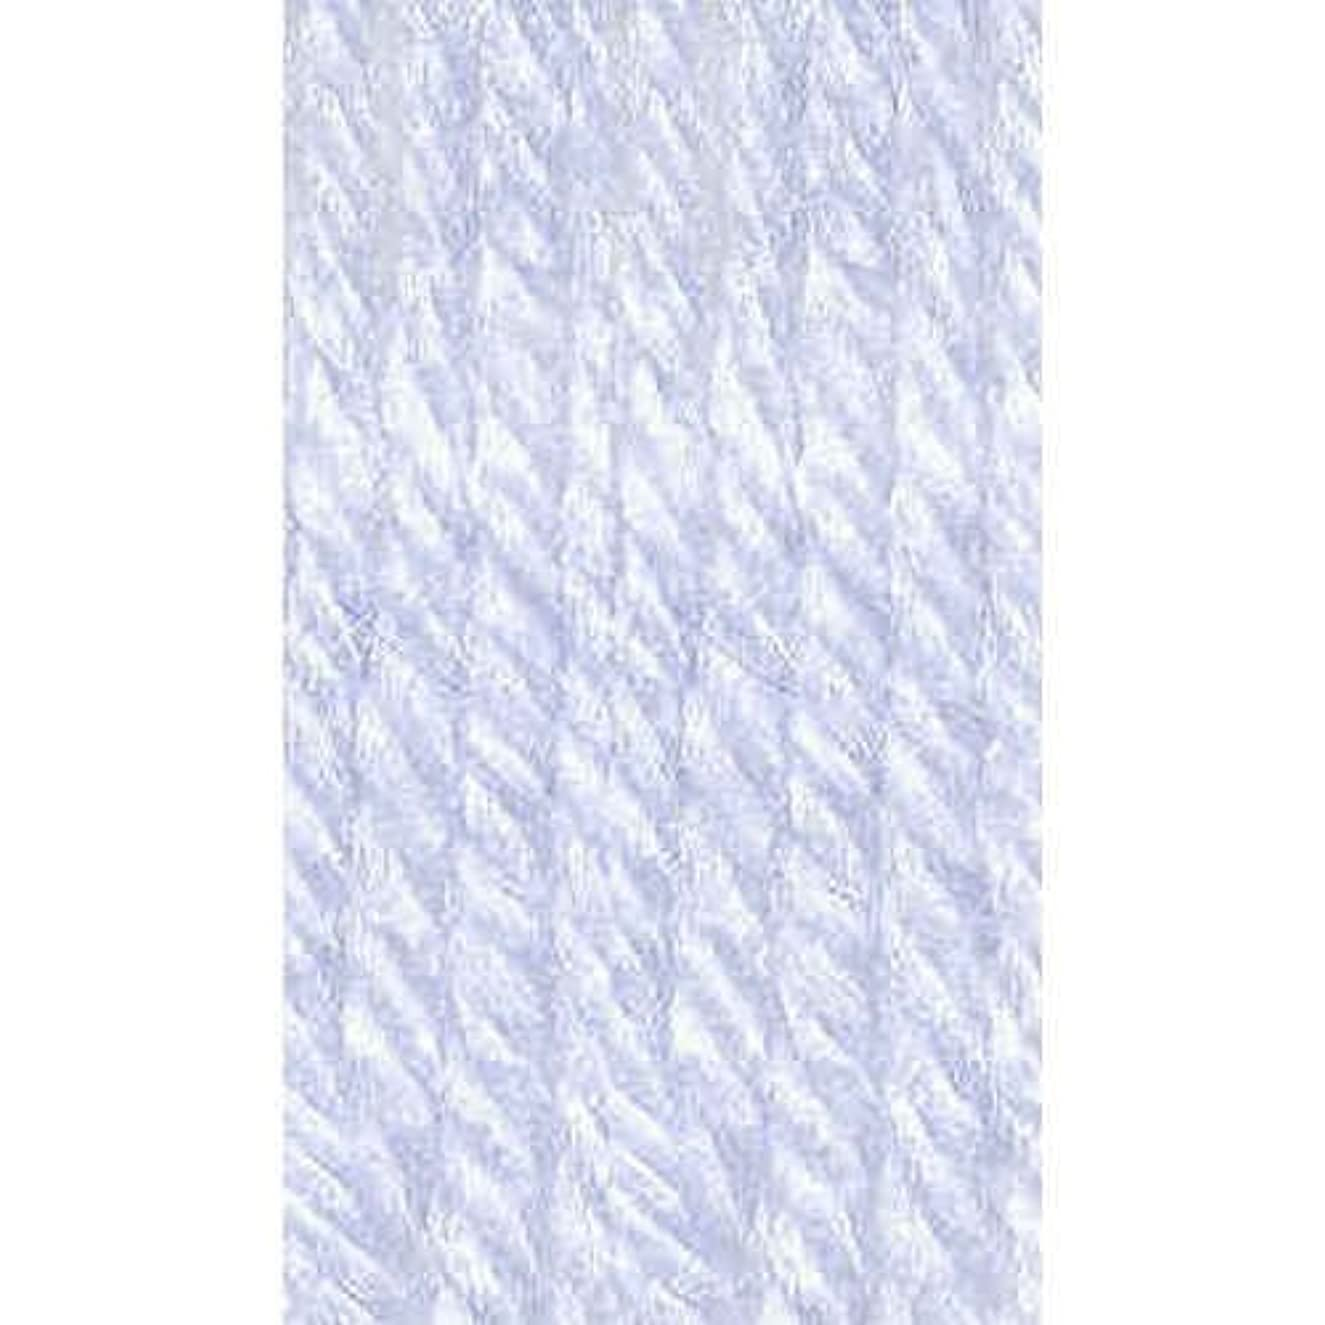 Plymouth (5-Pack) Dreambaby DK Yarn Pale Blue 0102-5P